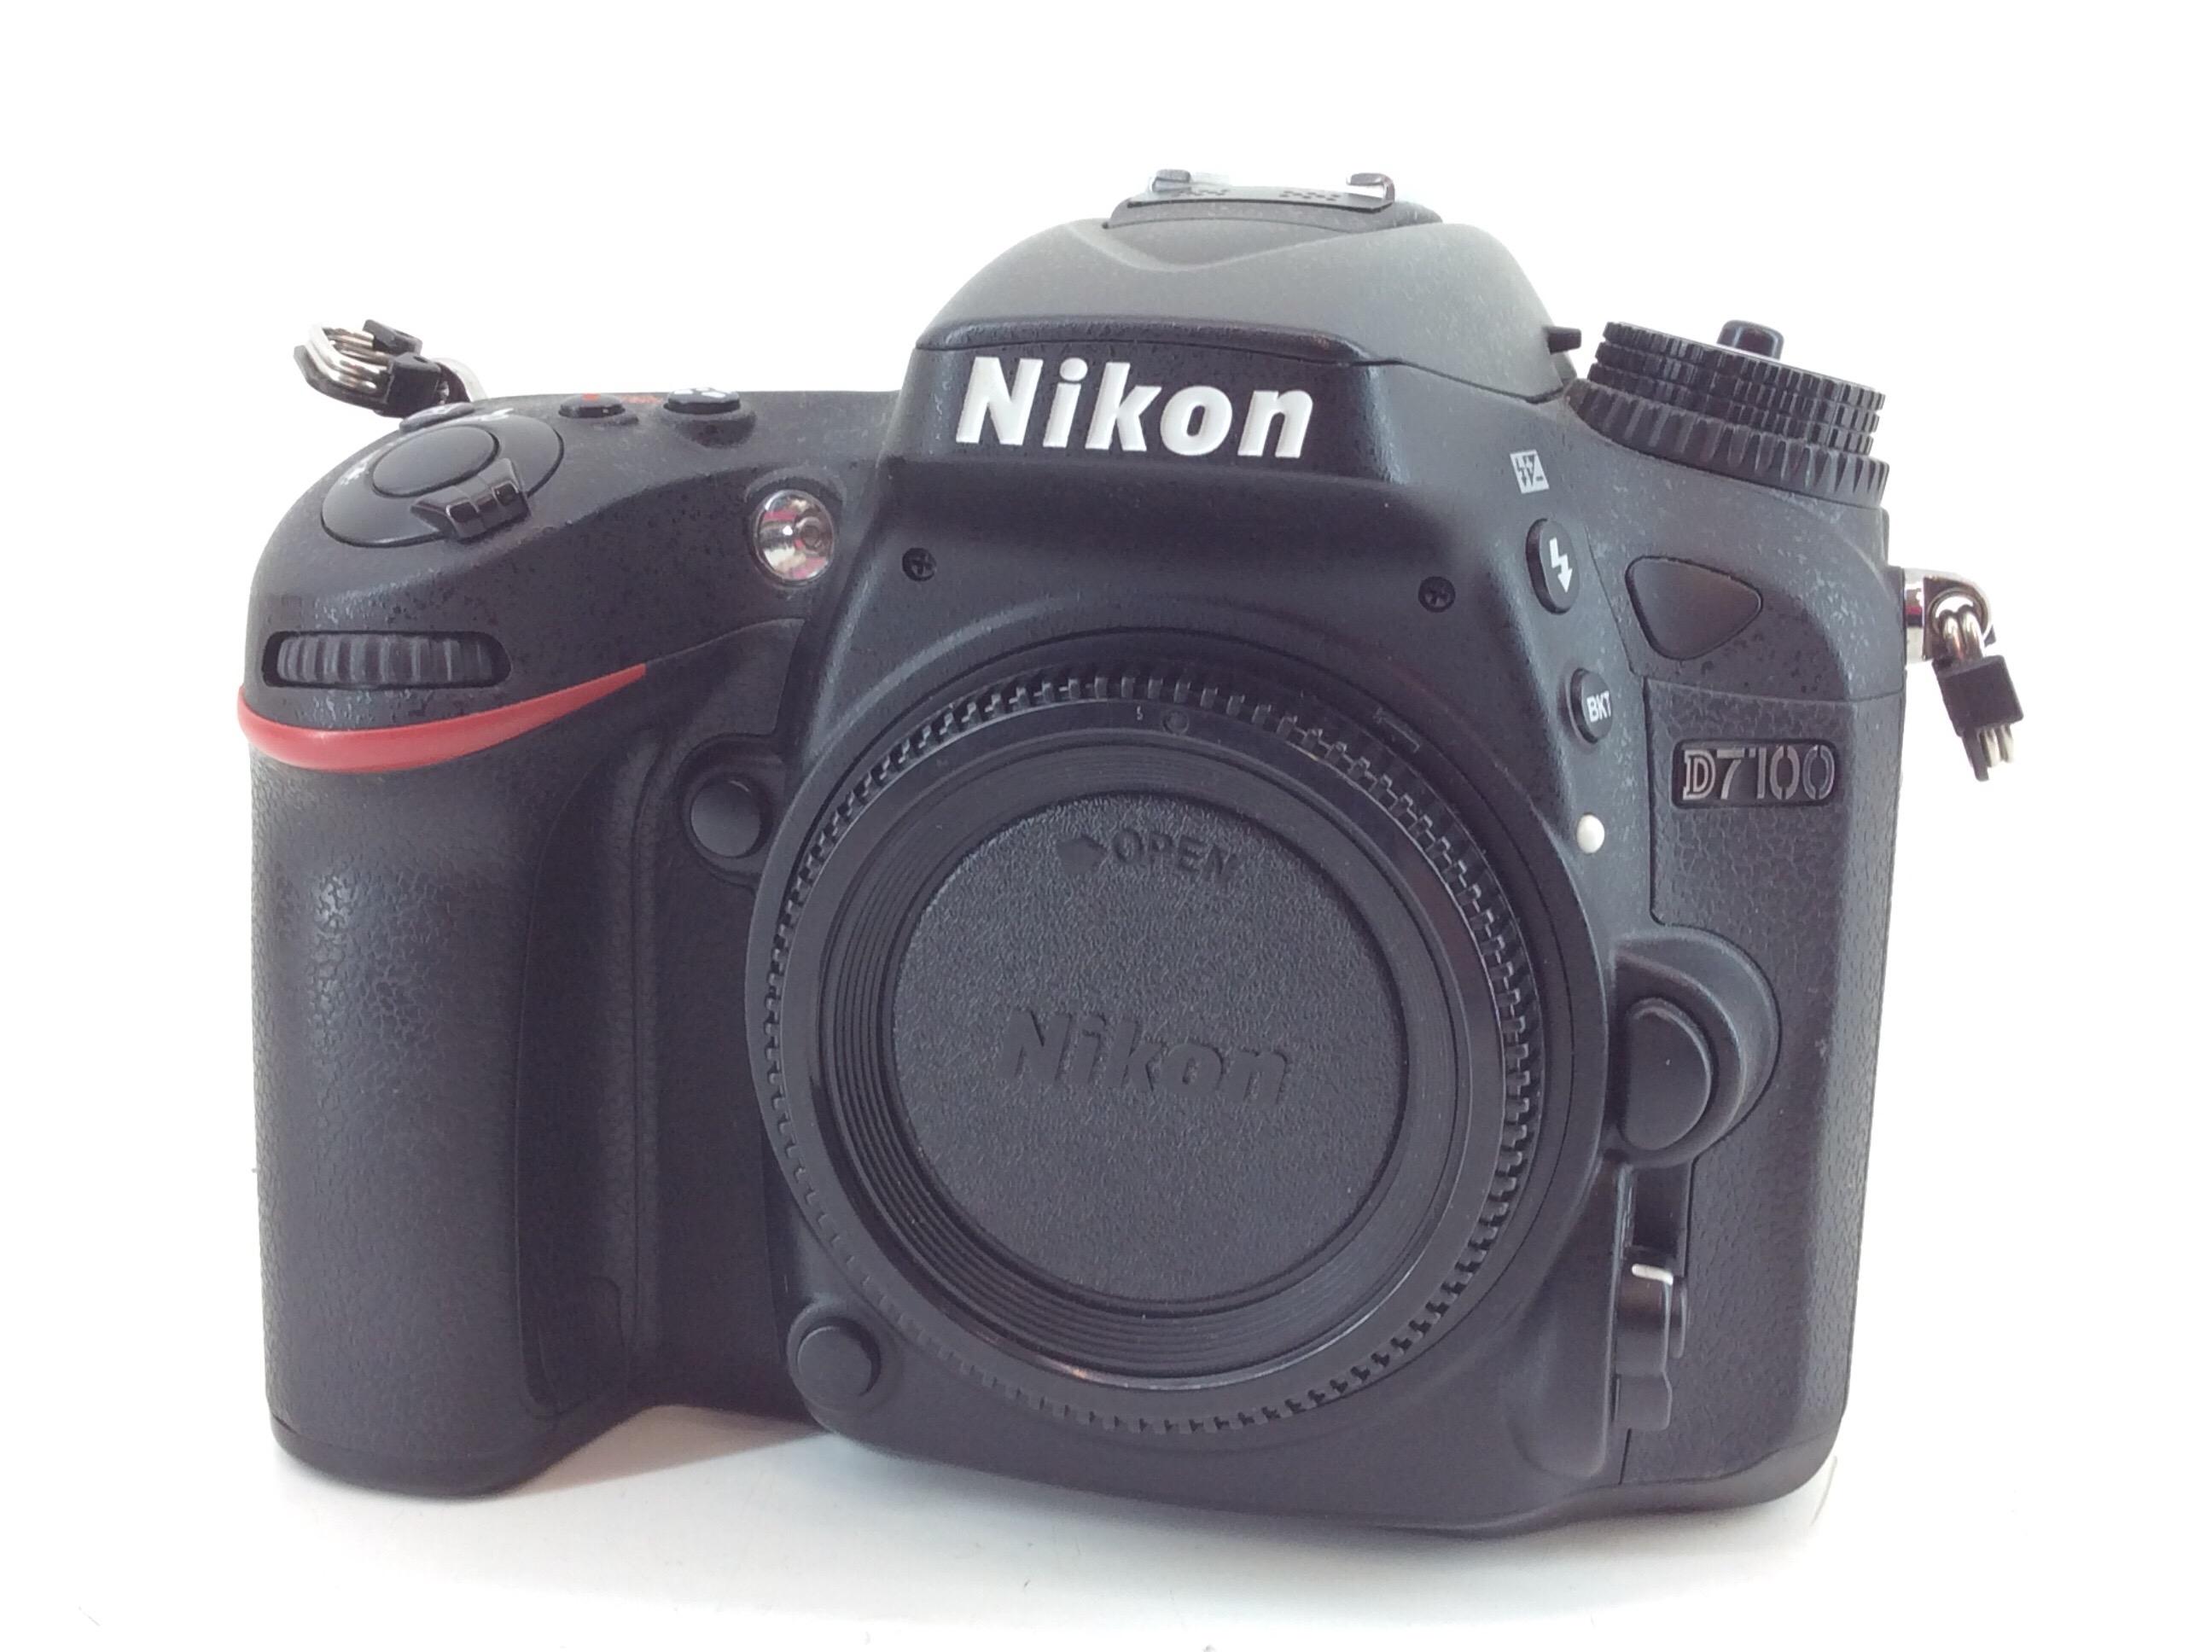 CAMARA DIGITAL REFLEX NIKON D7100